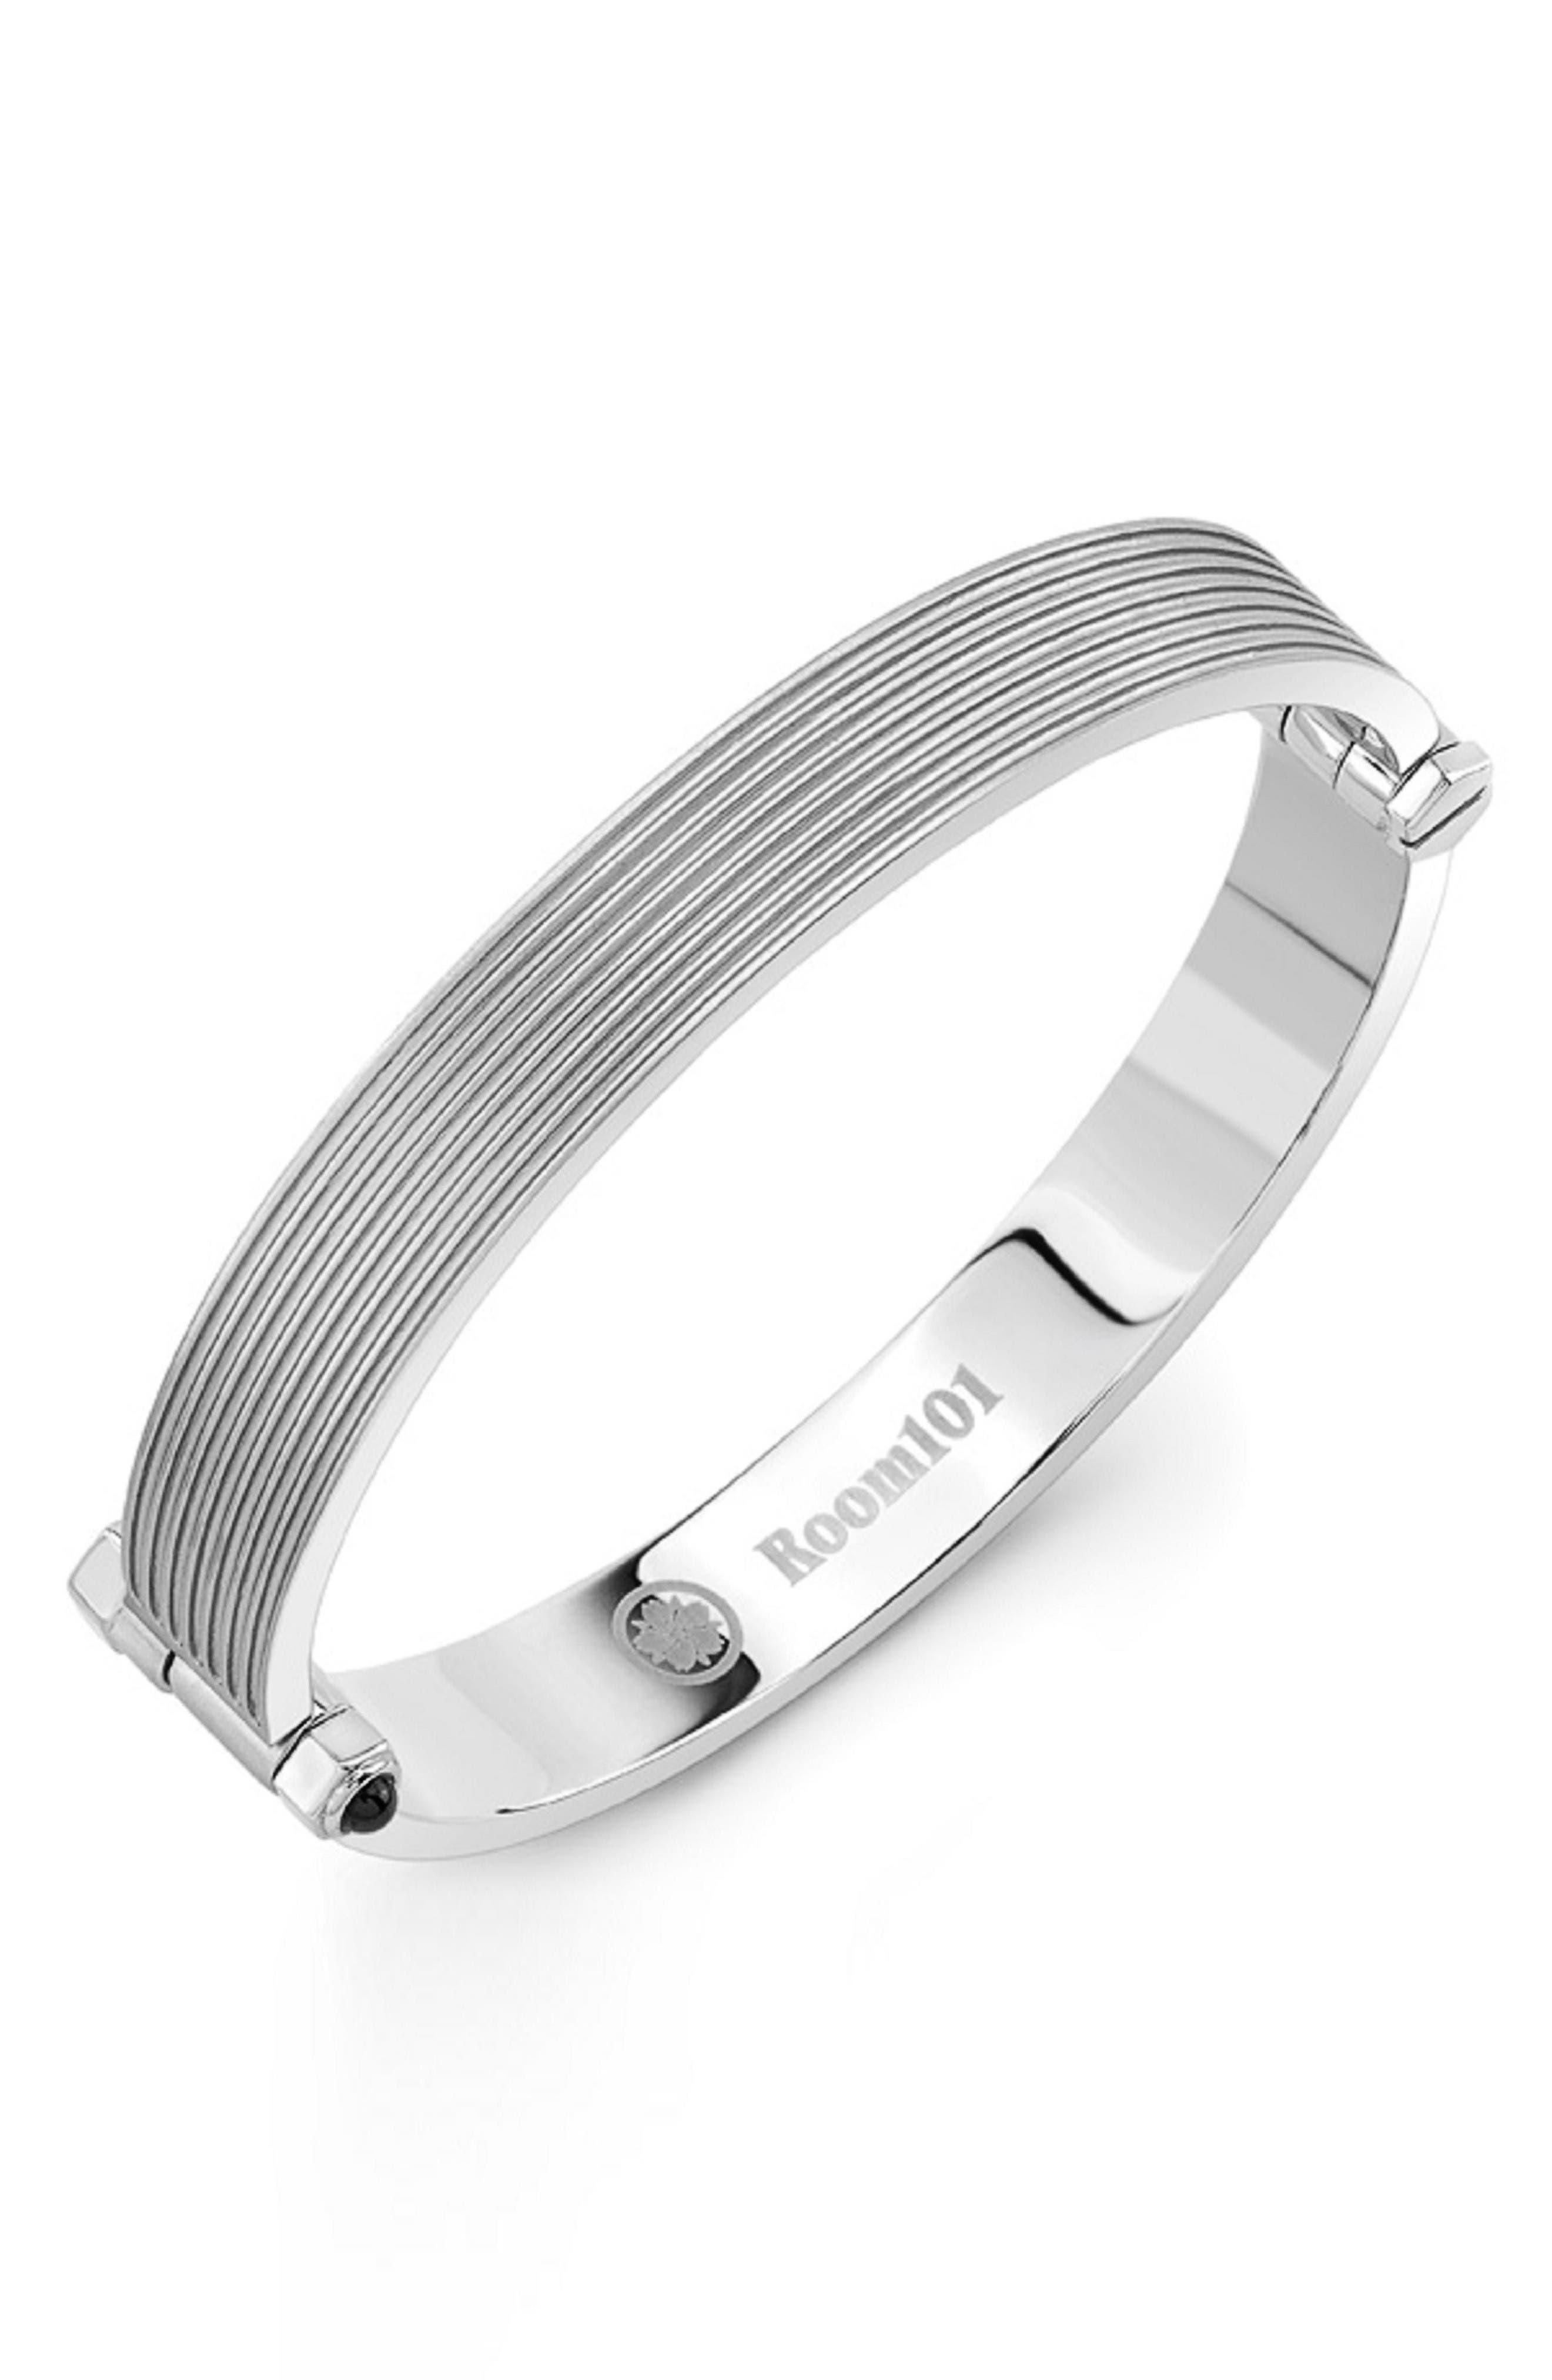 Main Image - Room101 Stainless Steel Bracelet